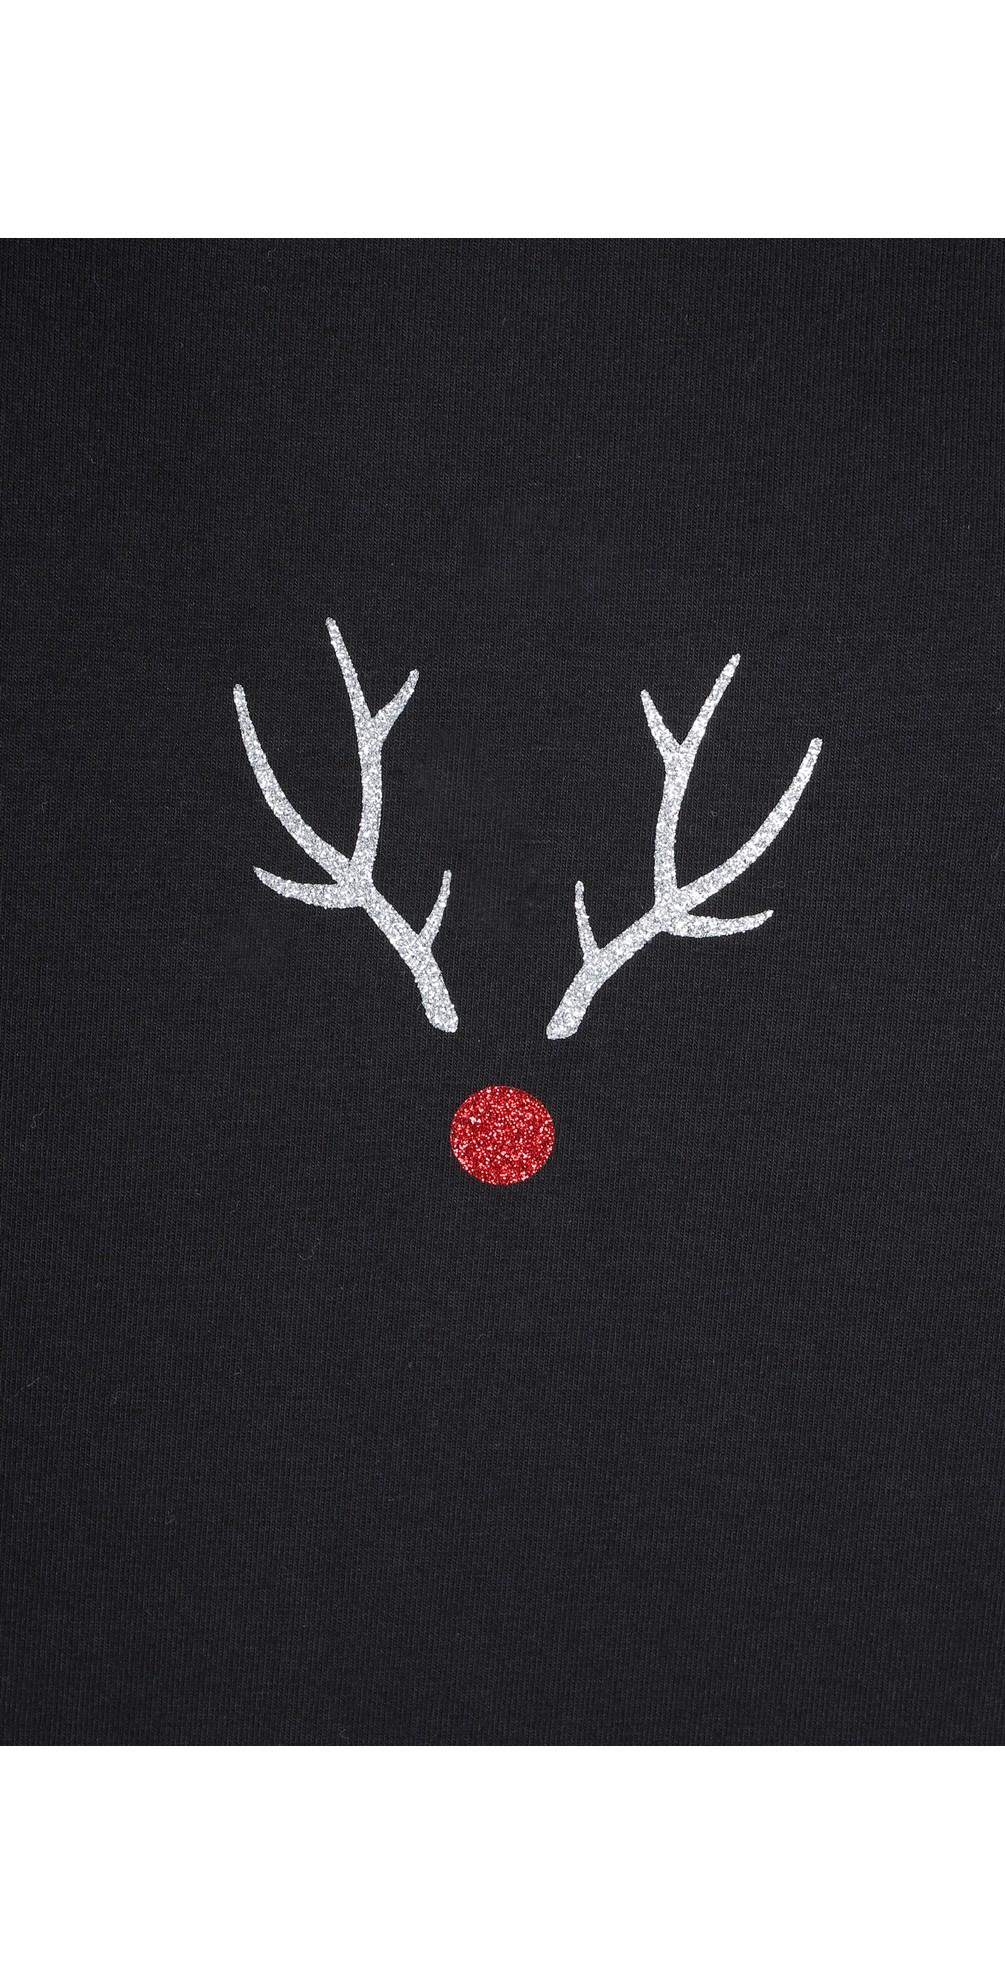 Tasha Reindeer Top main image